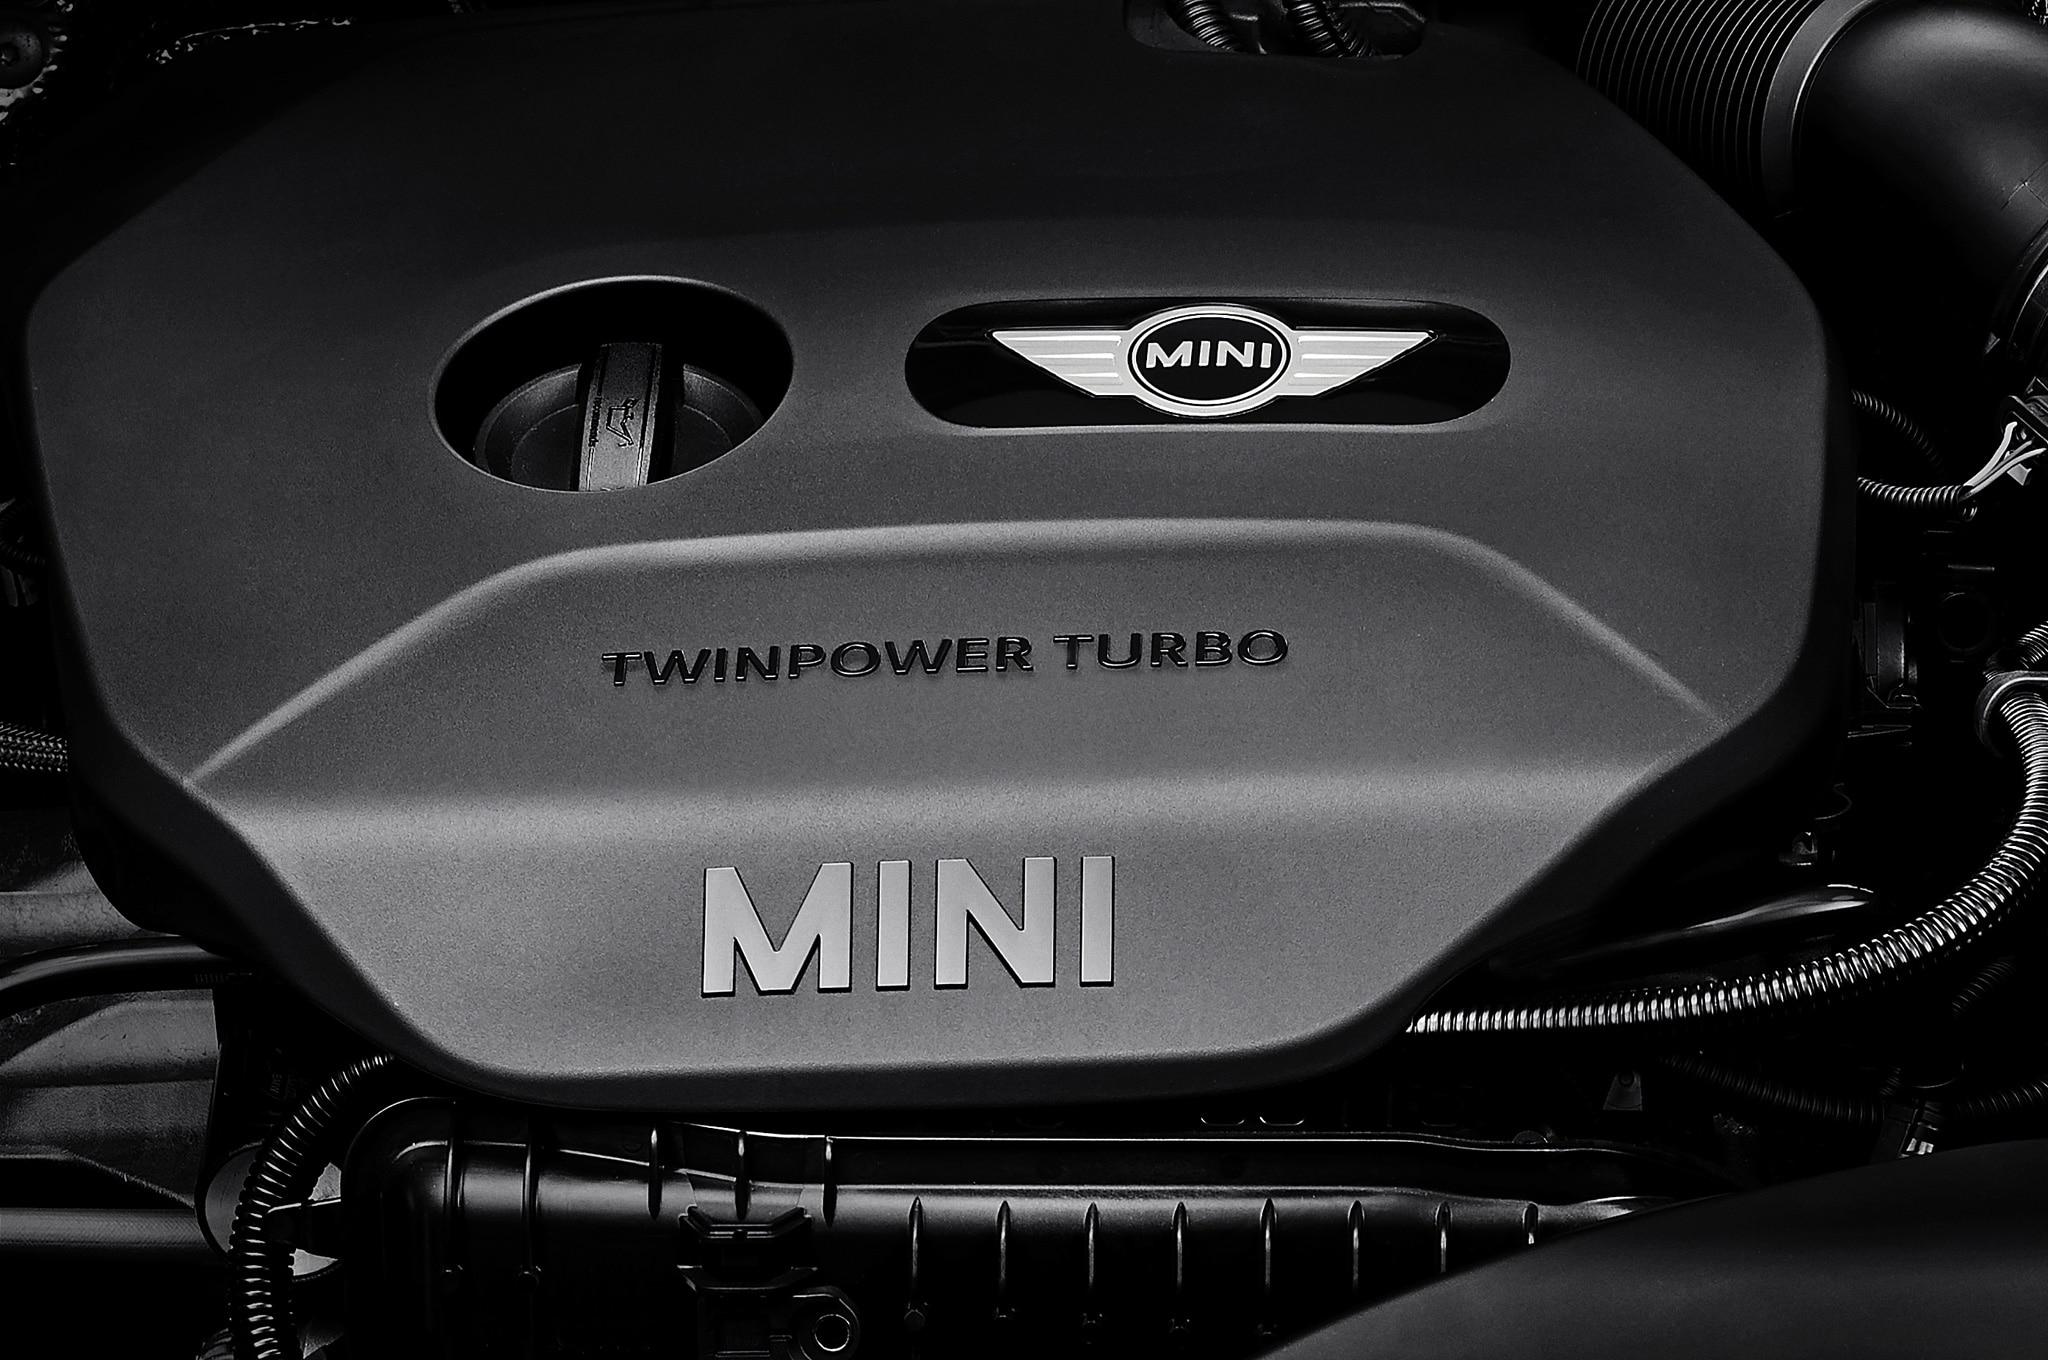 2014 Mini Cooper Three Cylinder Turbo Engine1